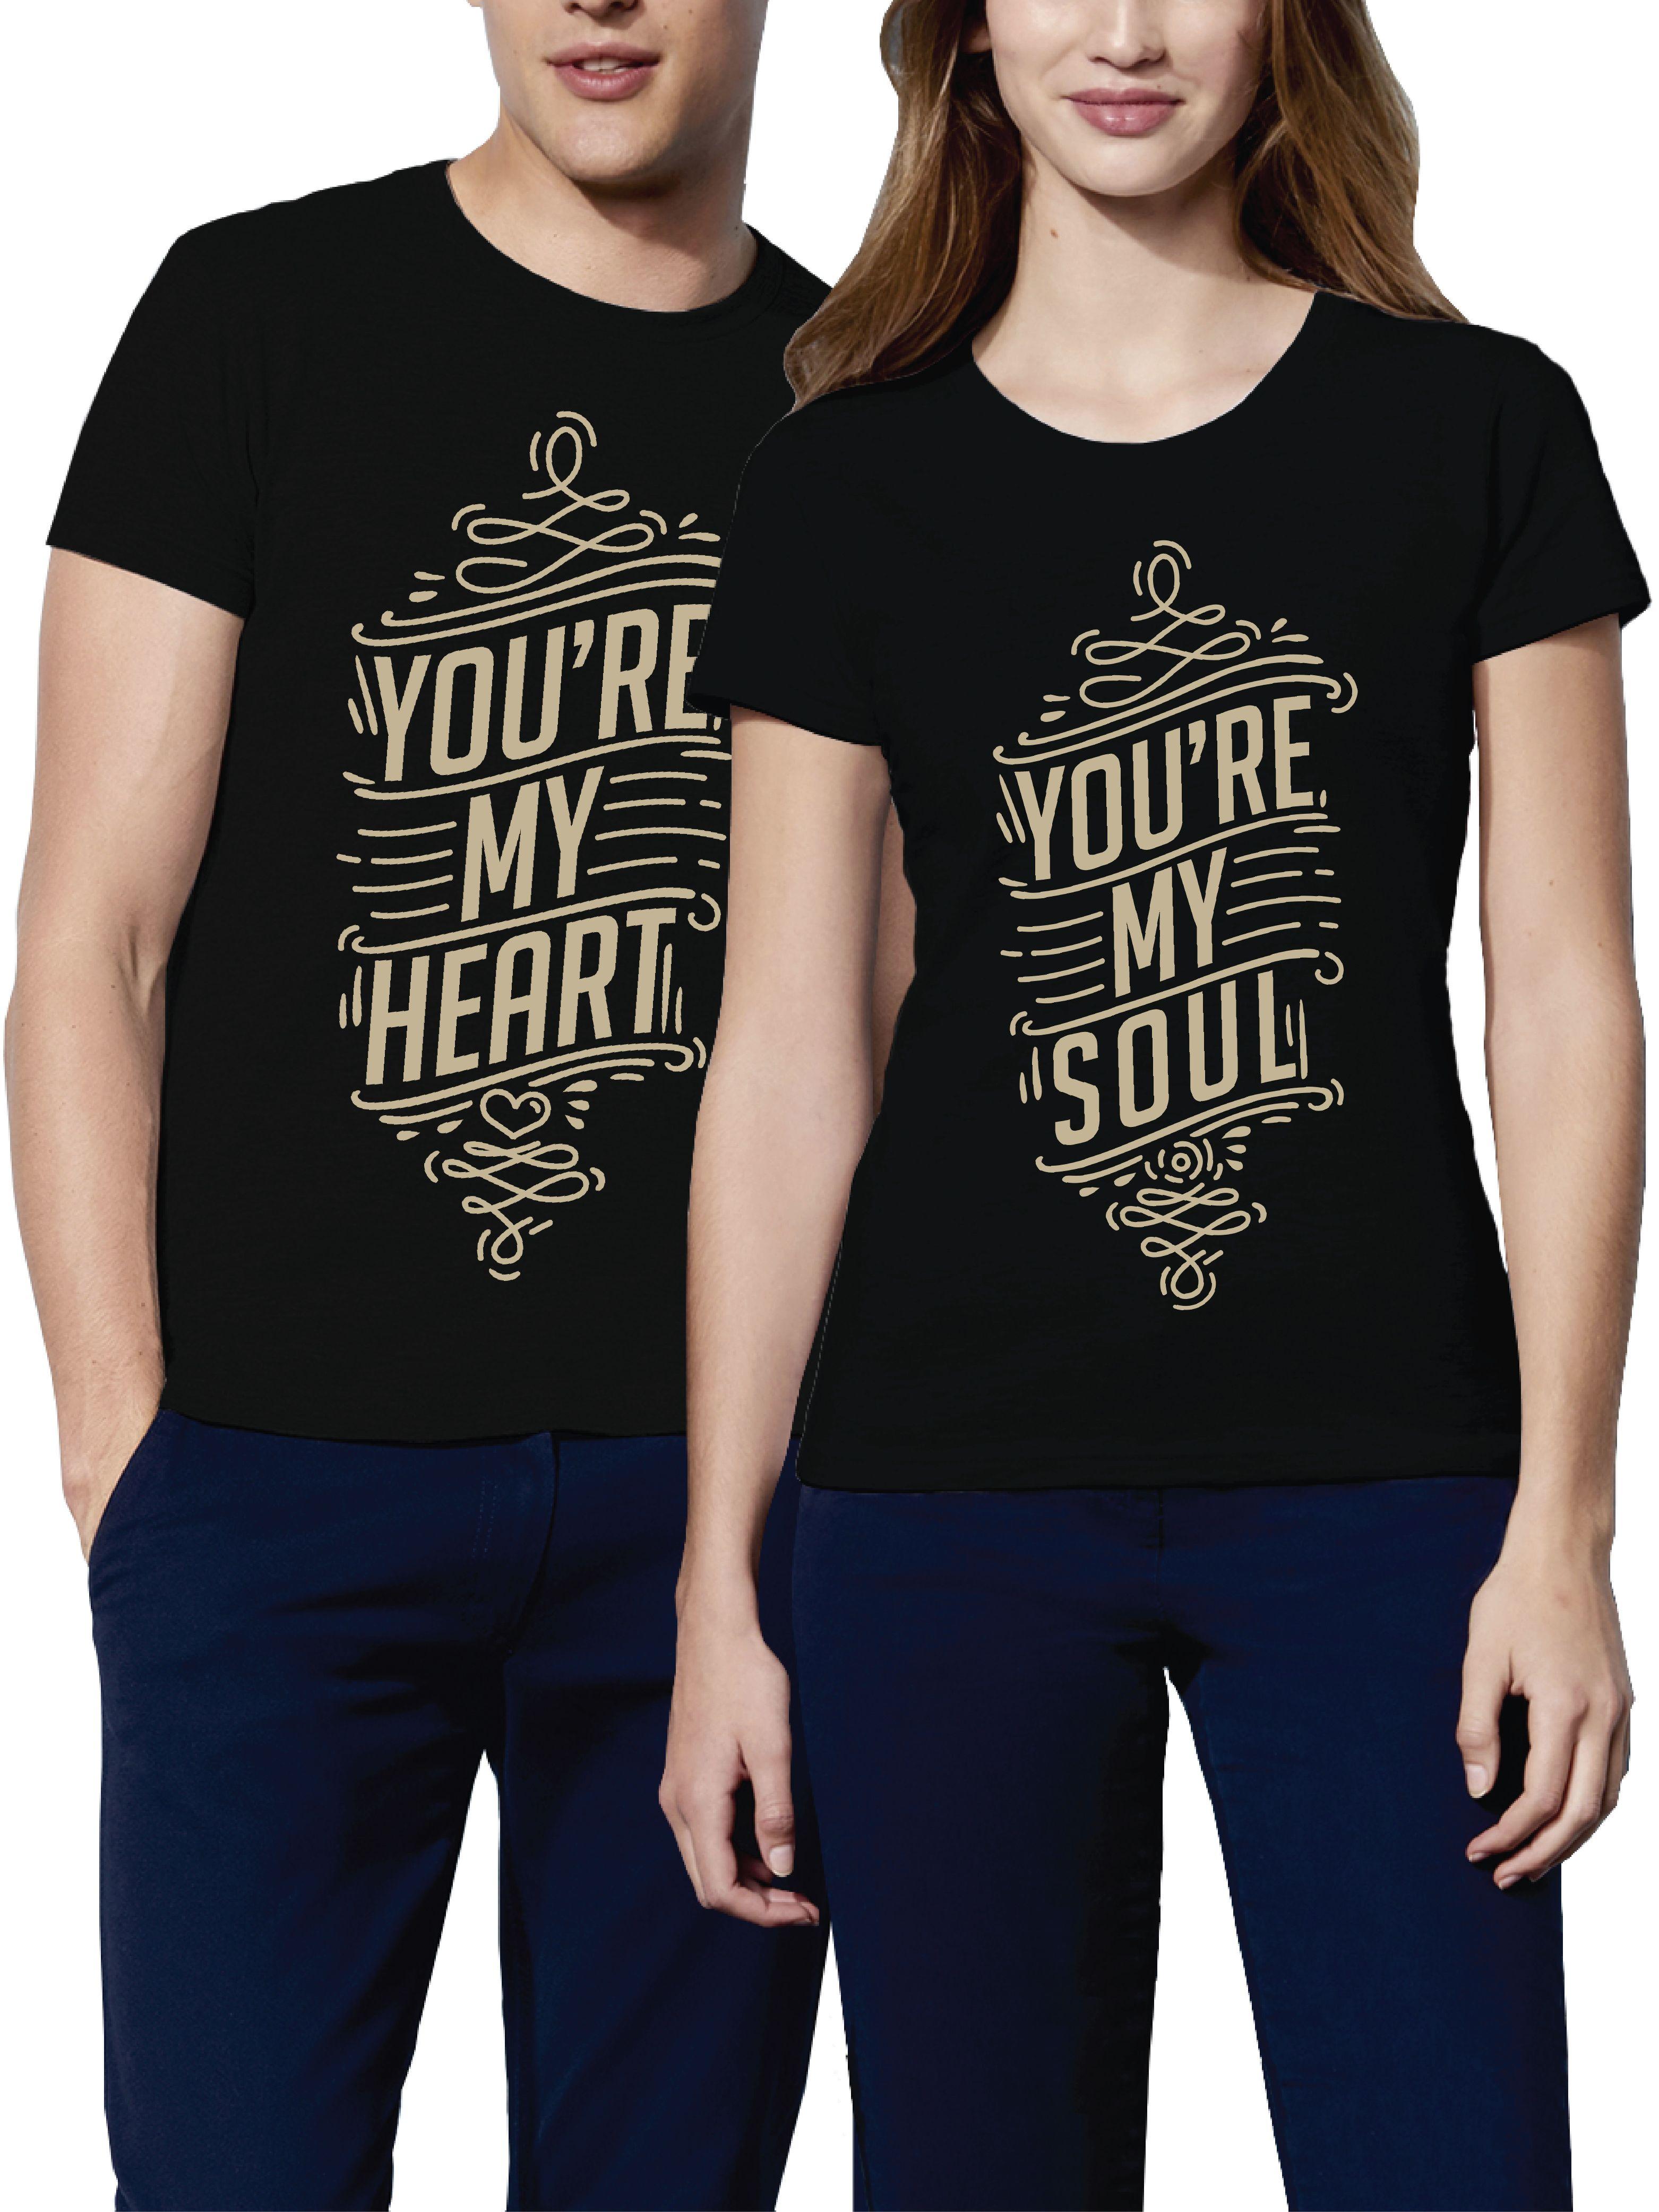 pärchen t-shirts / batman t shirt / batman couple shirts / couple shirts / his and hers shirts / couple t shirts / couples matching shirts uR8TlZg